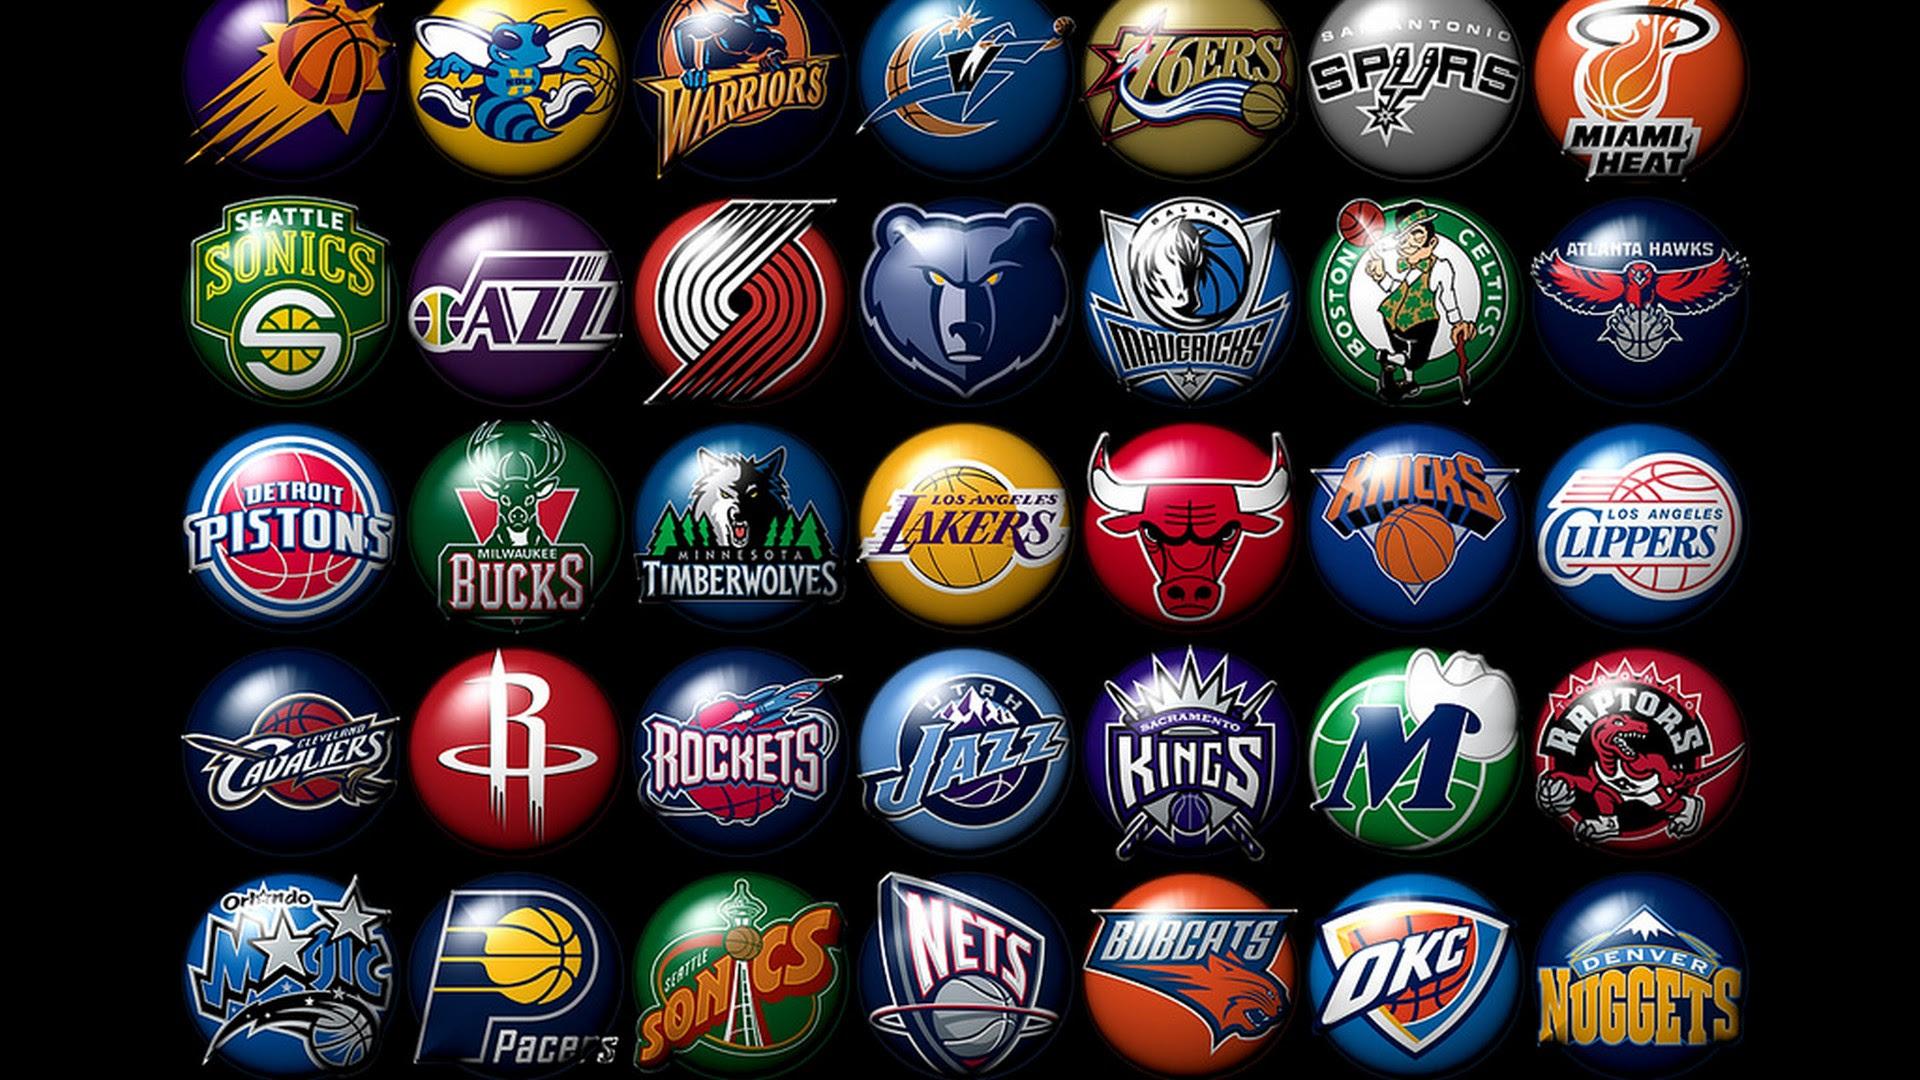 NBA HD Wallpapers | 2019 Basketball Wallpaper